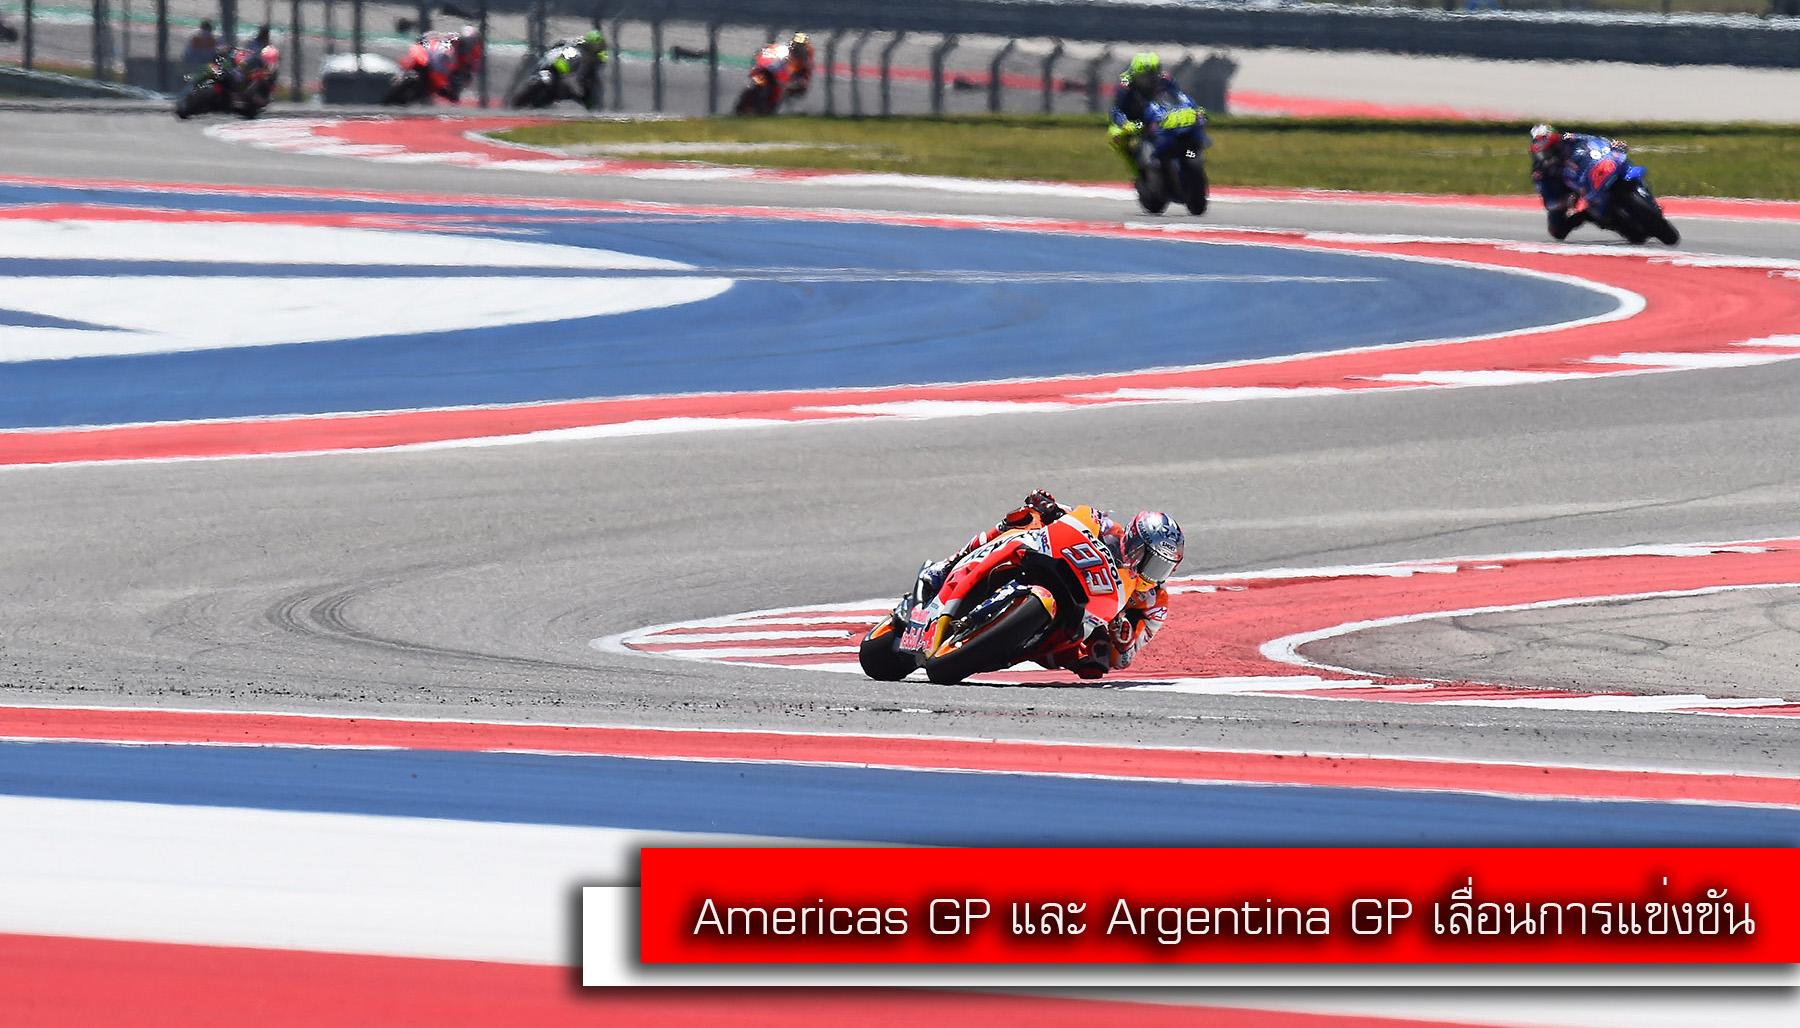 Americas GP และ Argentina GP เลื่อนการแข่งขัน